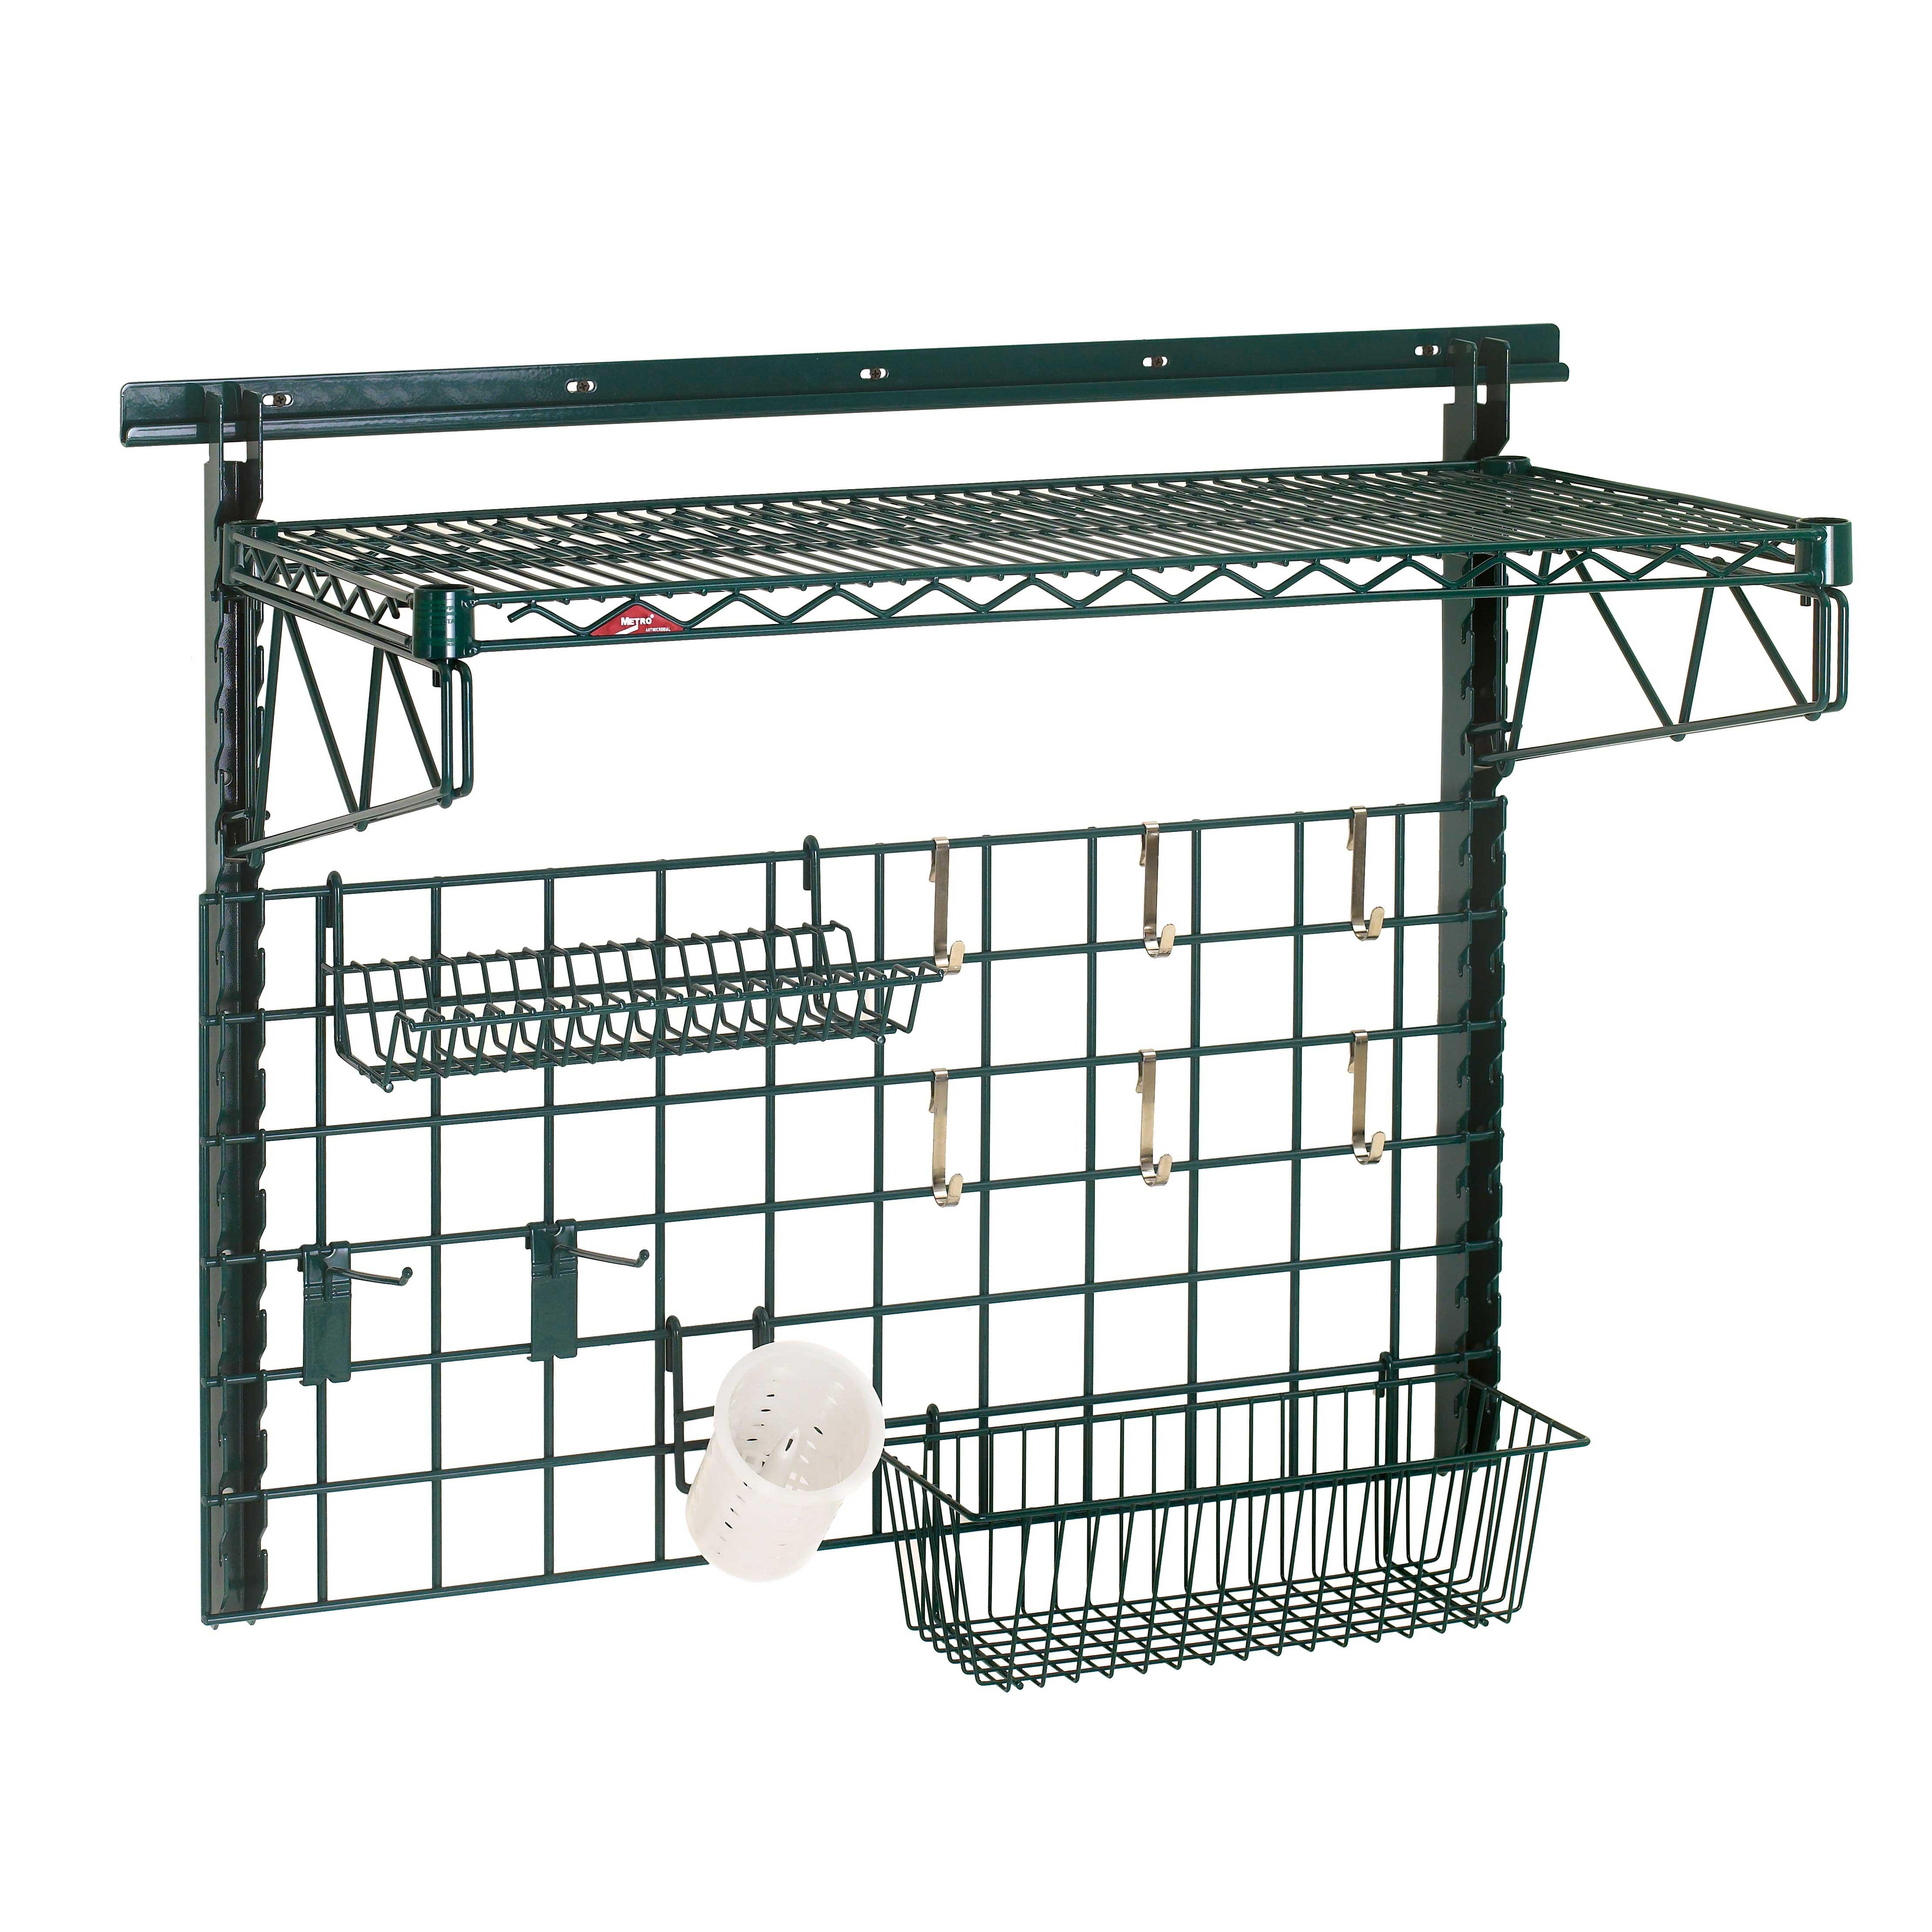 Metro SWK36-1A1-SR shelving, wall grid unit